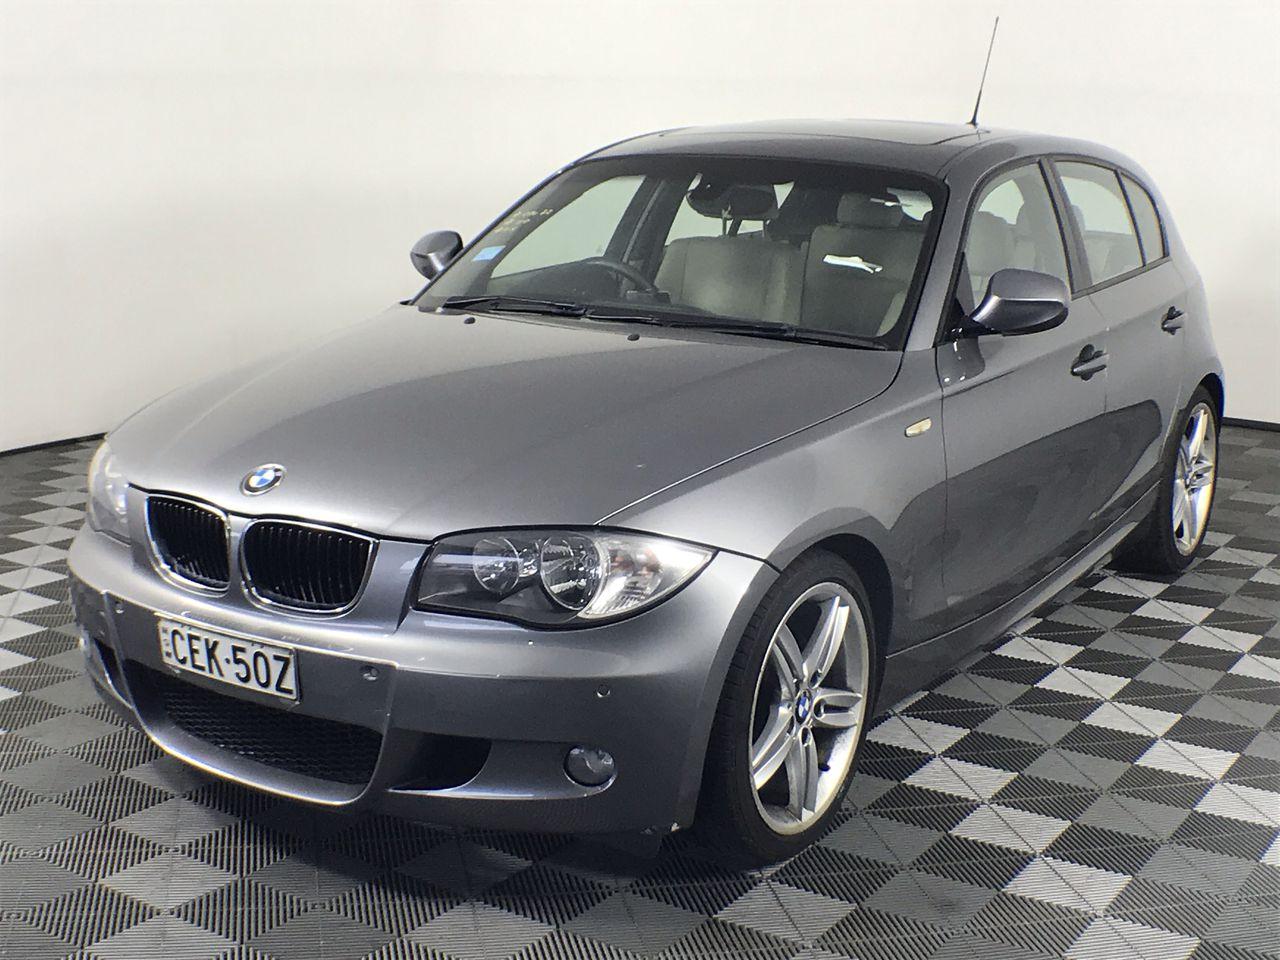 2011 BMW 1 20i E87 Automatic Hatchback 66,316km